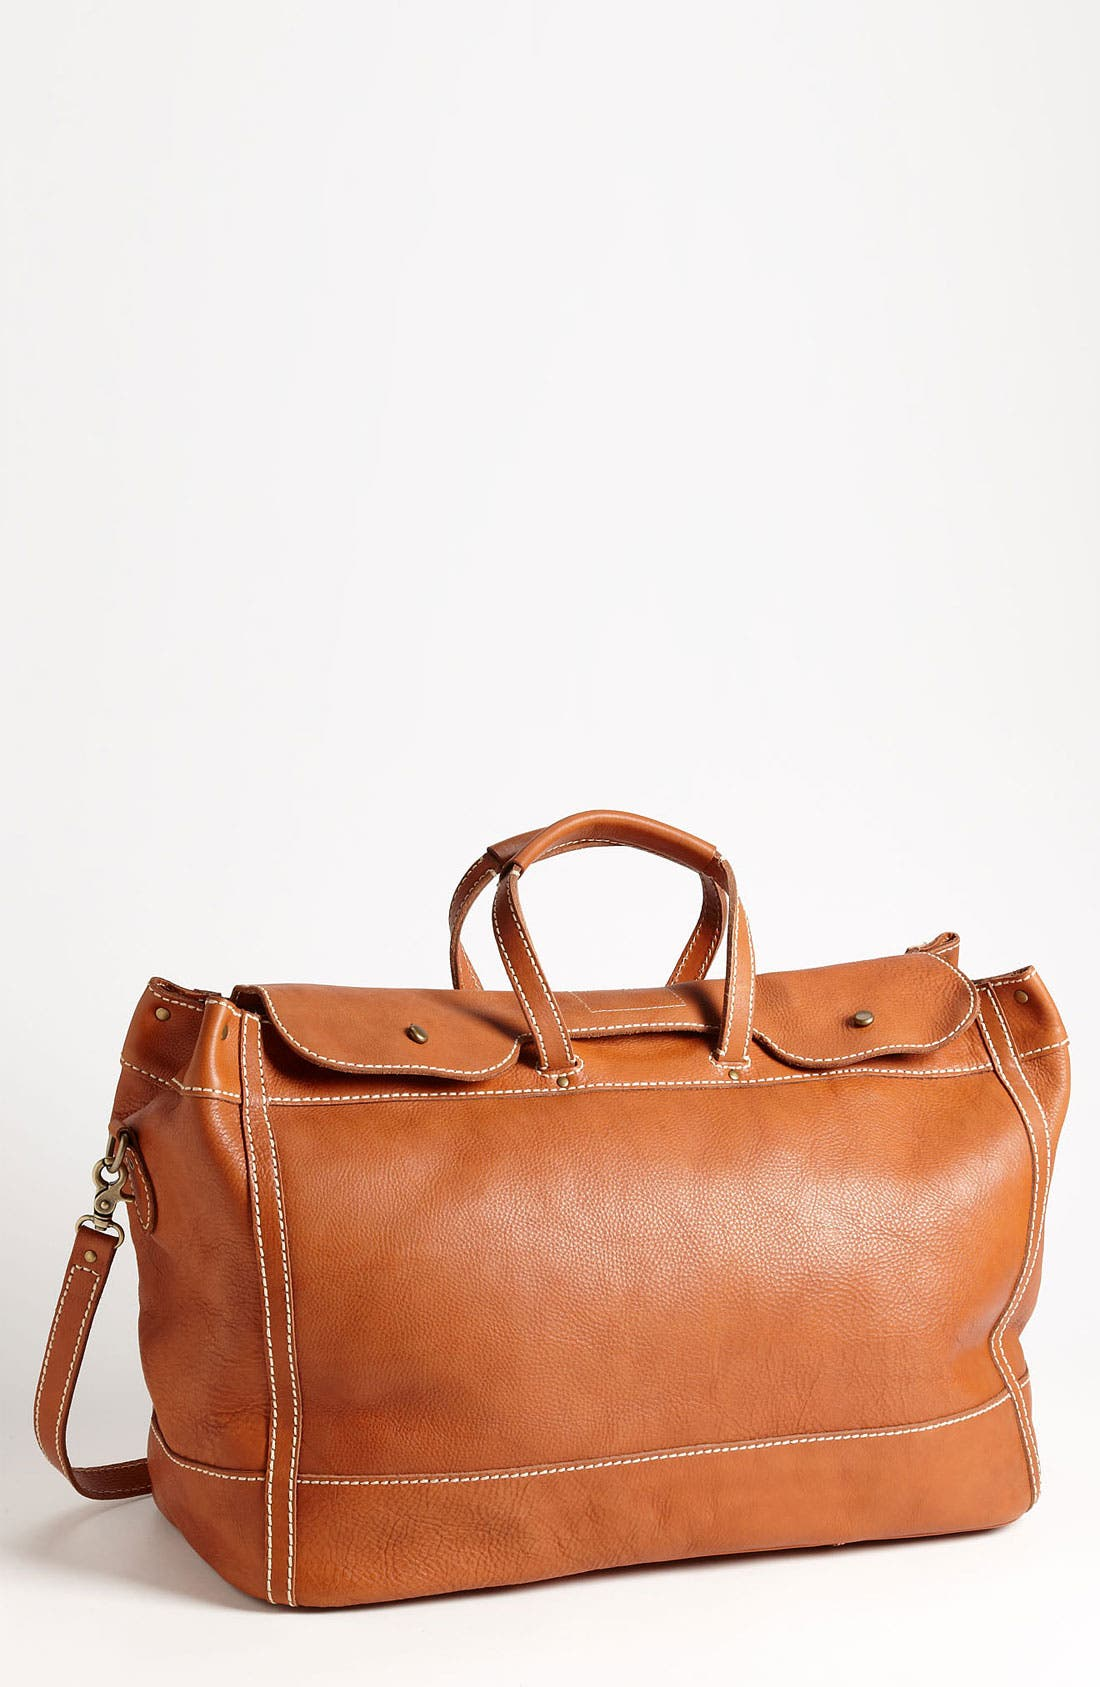 Main Image - Jean Shop 'Signature' Bag